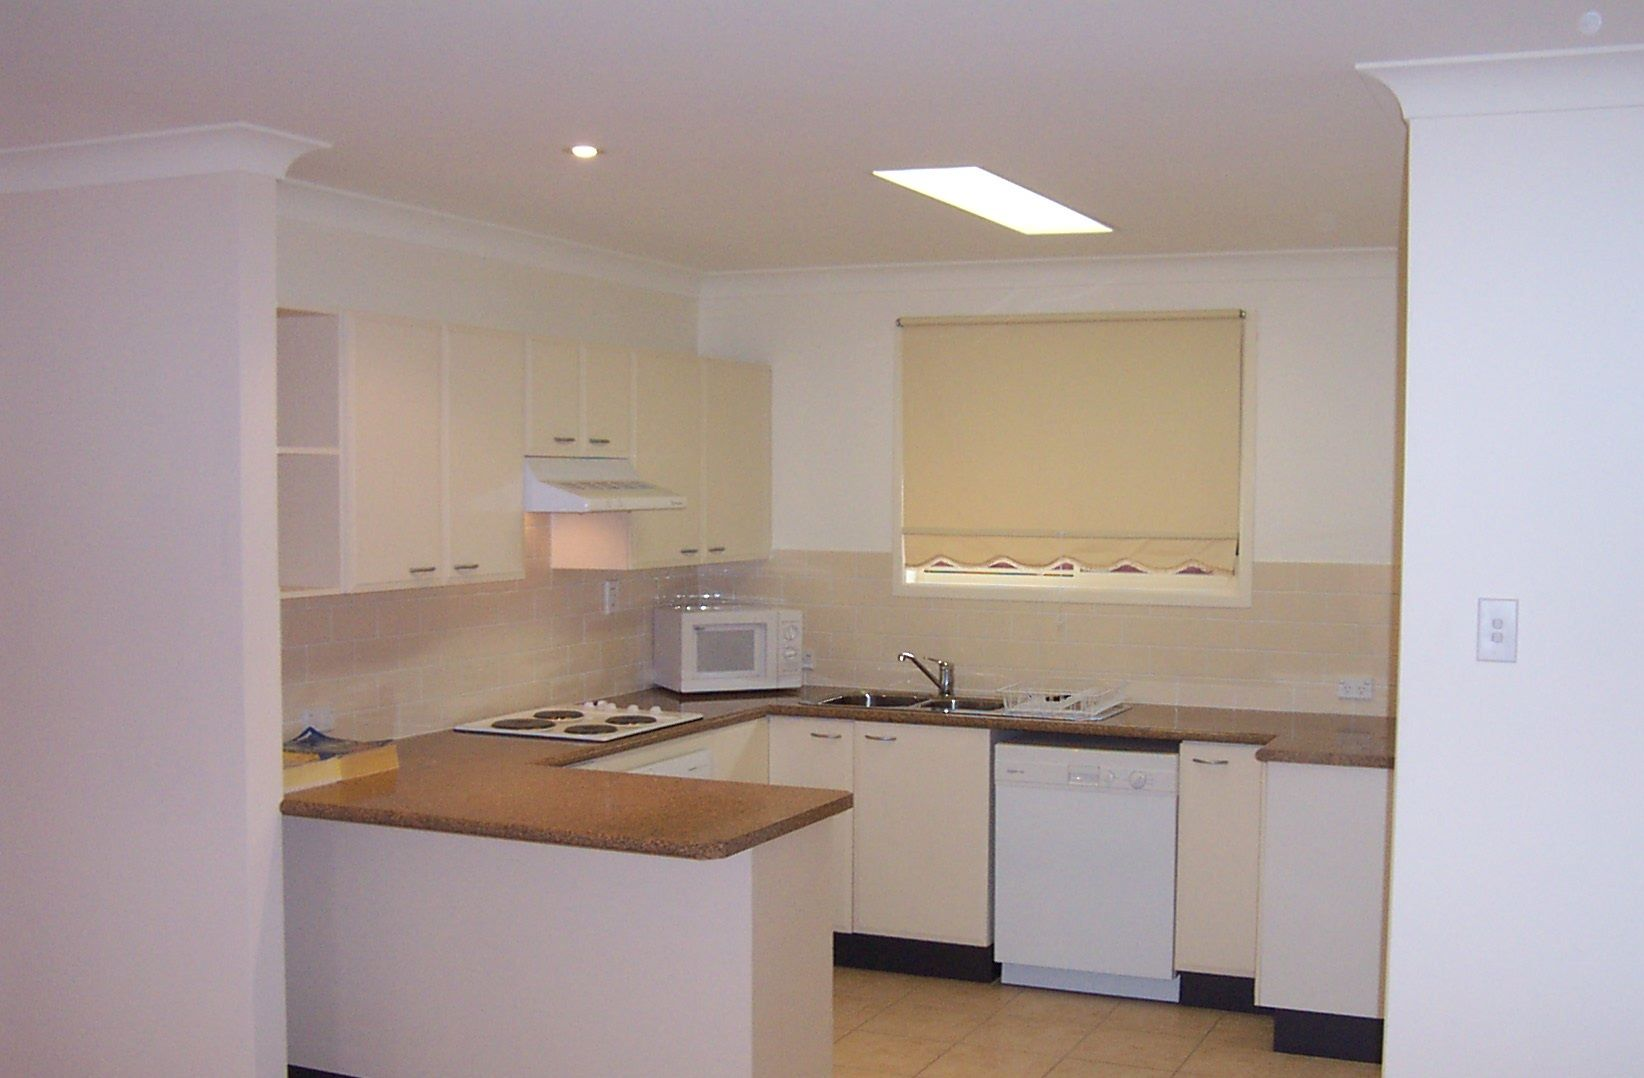 3/64-66 Paton Street, Woy Woy NSW 2256, Image 1